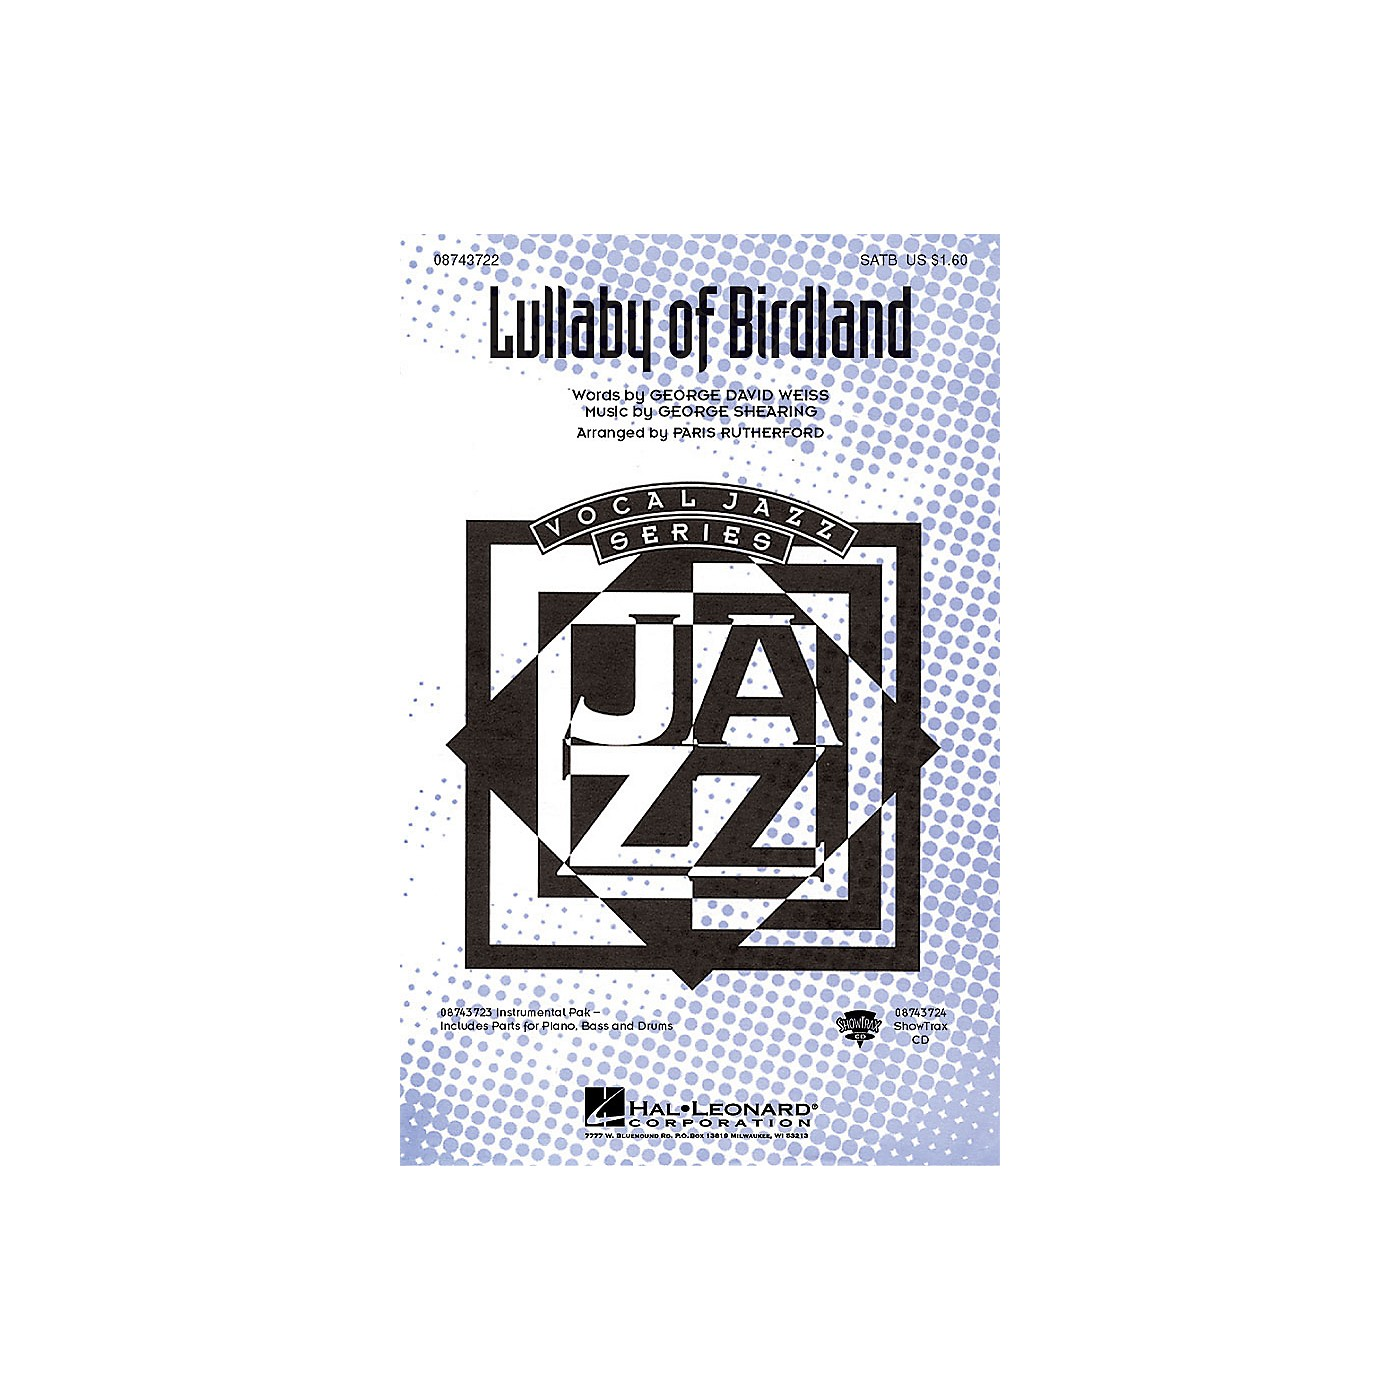 Hal Leonard Lullaby of Birdland SATB arranged by Paris Rutherford thumbnail